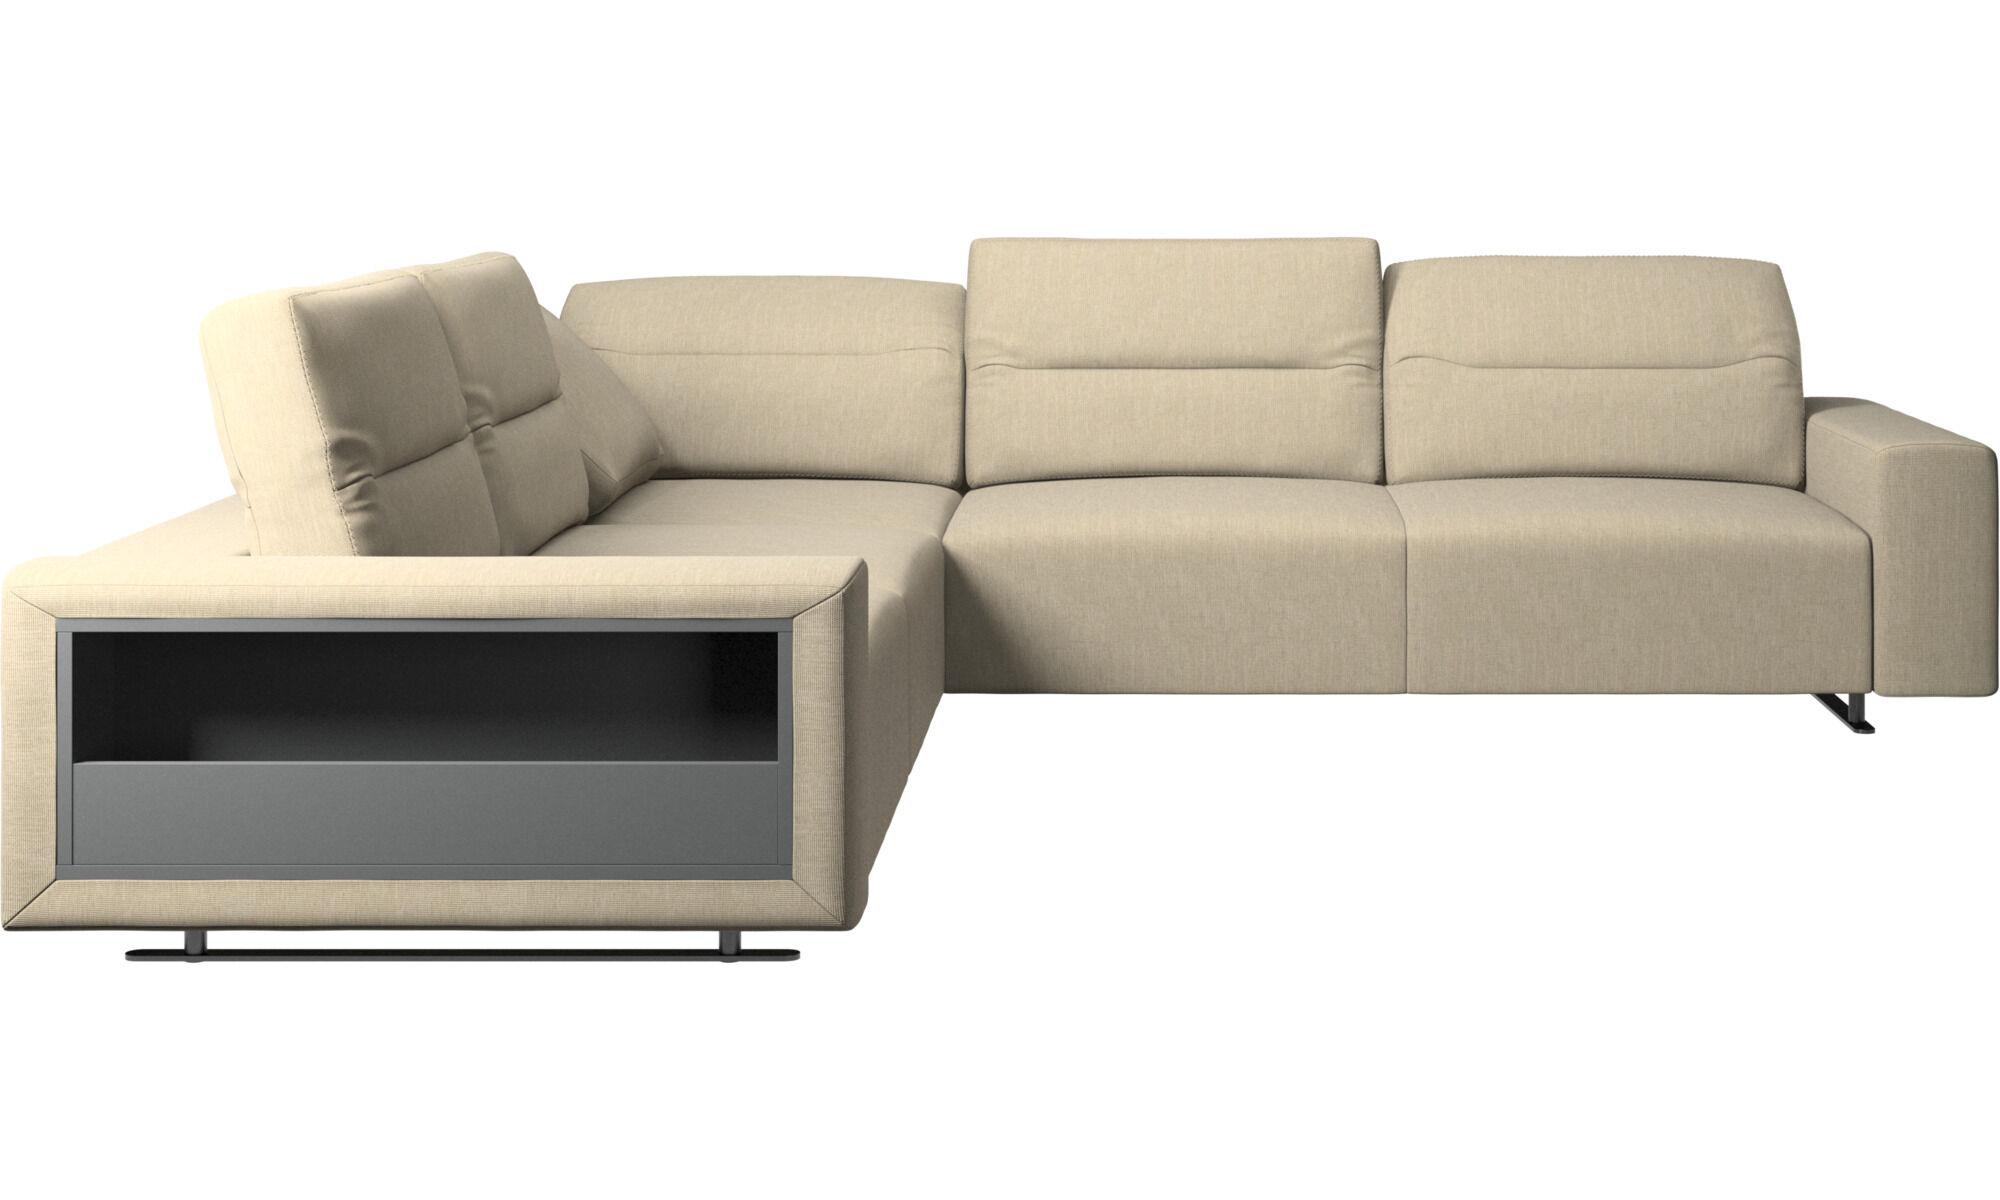 Corner Sofas   Hampton Corner Sofa With Adjustable Back And Storage   Brown    Fabric